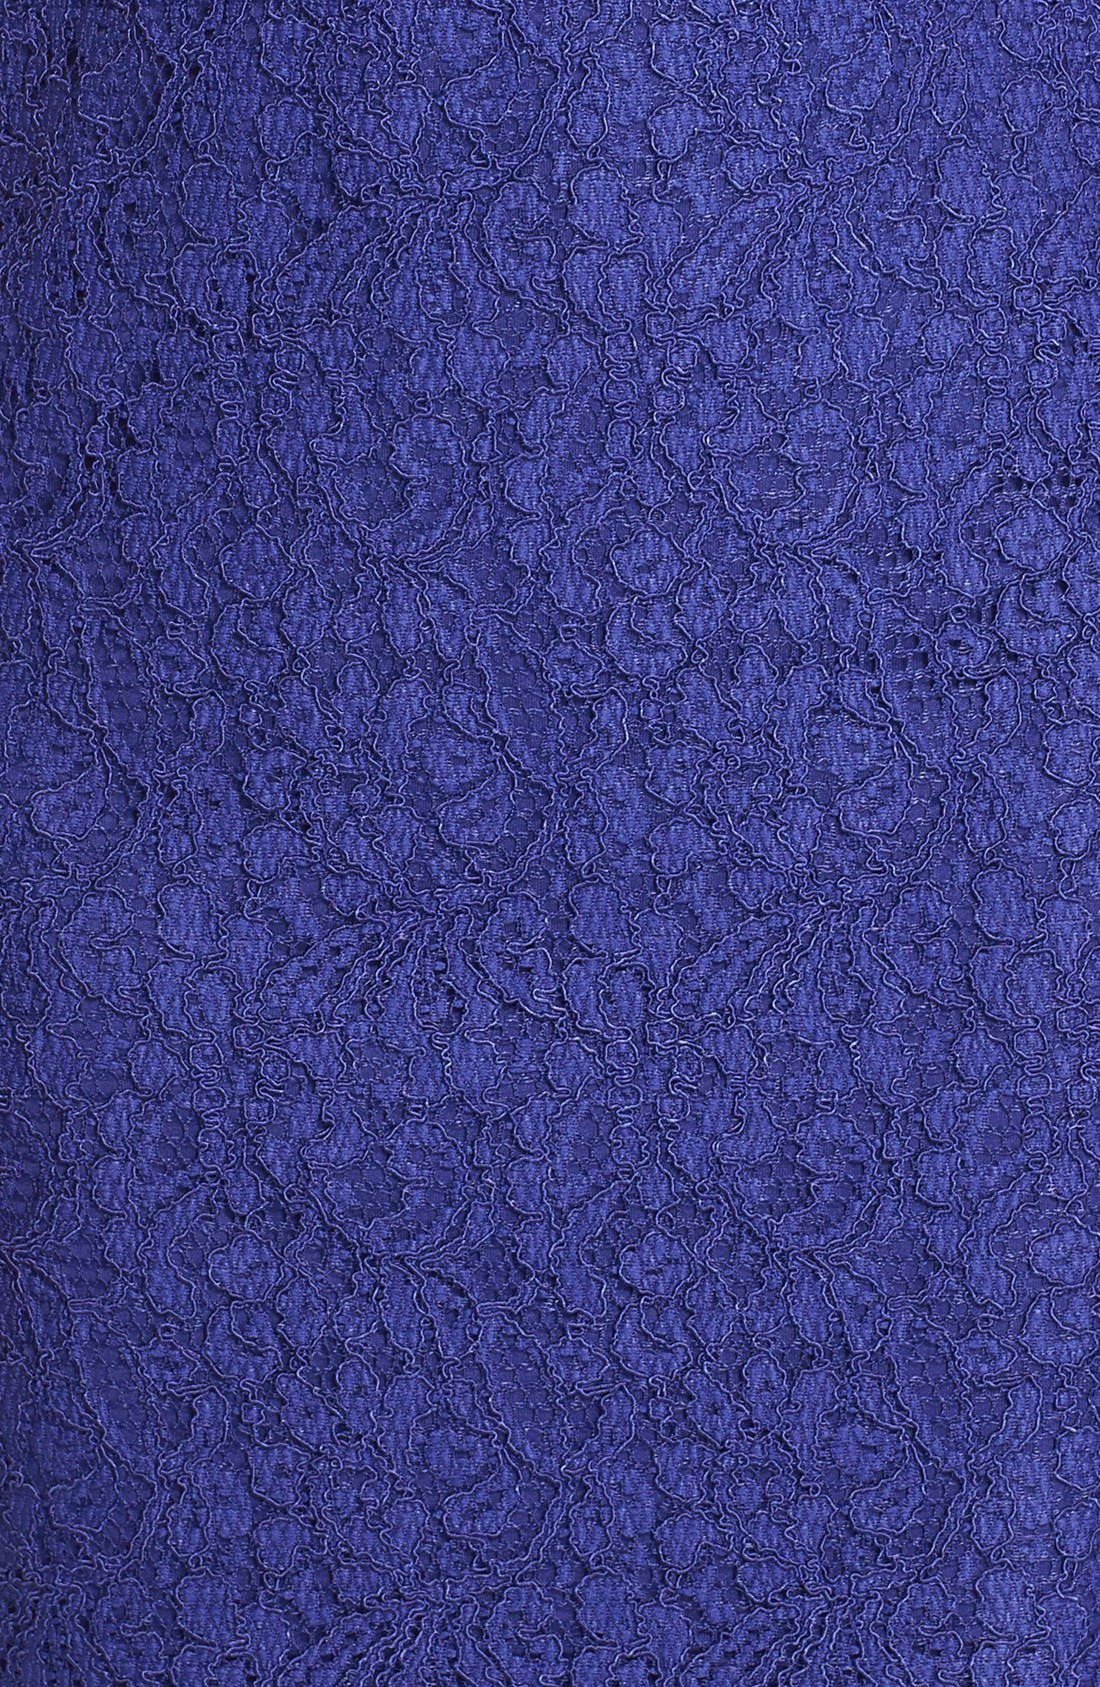 Boatneck Lace Sheath Dress,                             Alternate thumbnail 108, color,